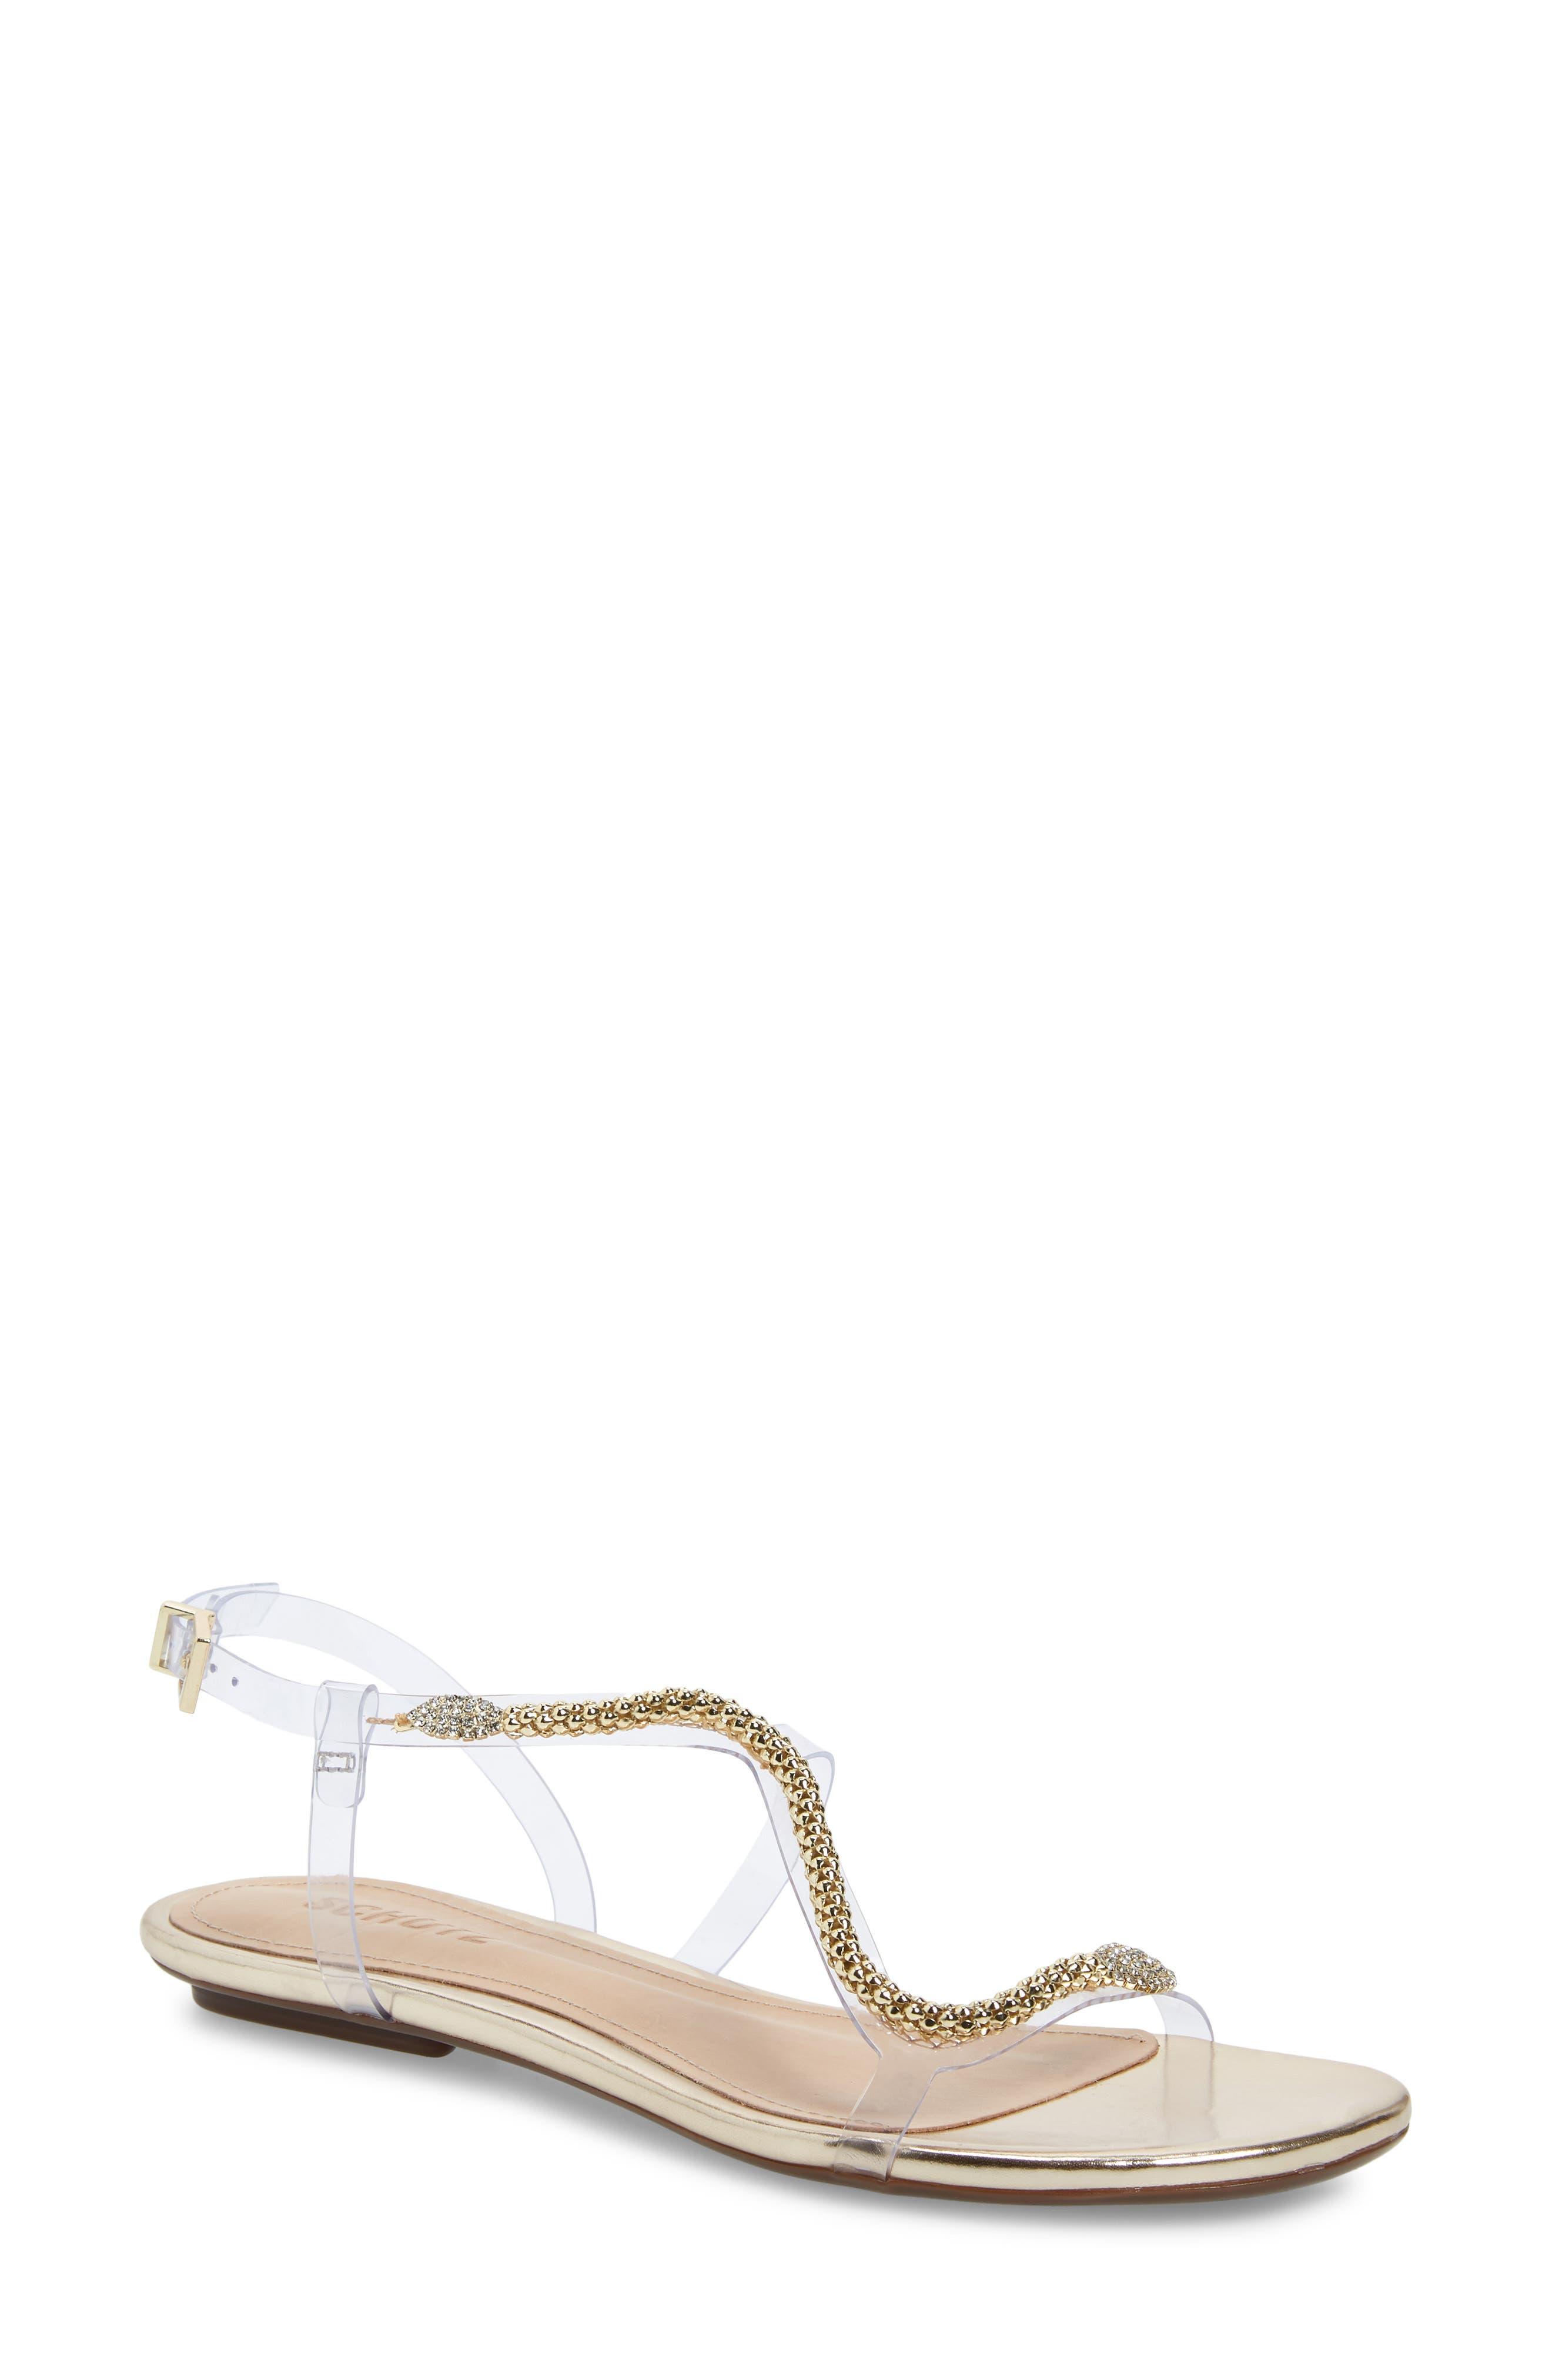 Gabbyl Embellished Sandal,                             Main thumbnail 1, color,                             PLATINA